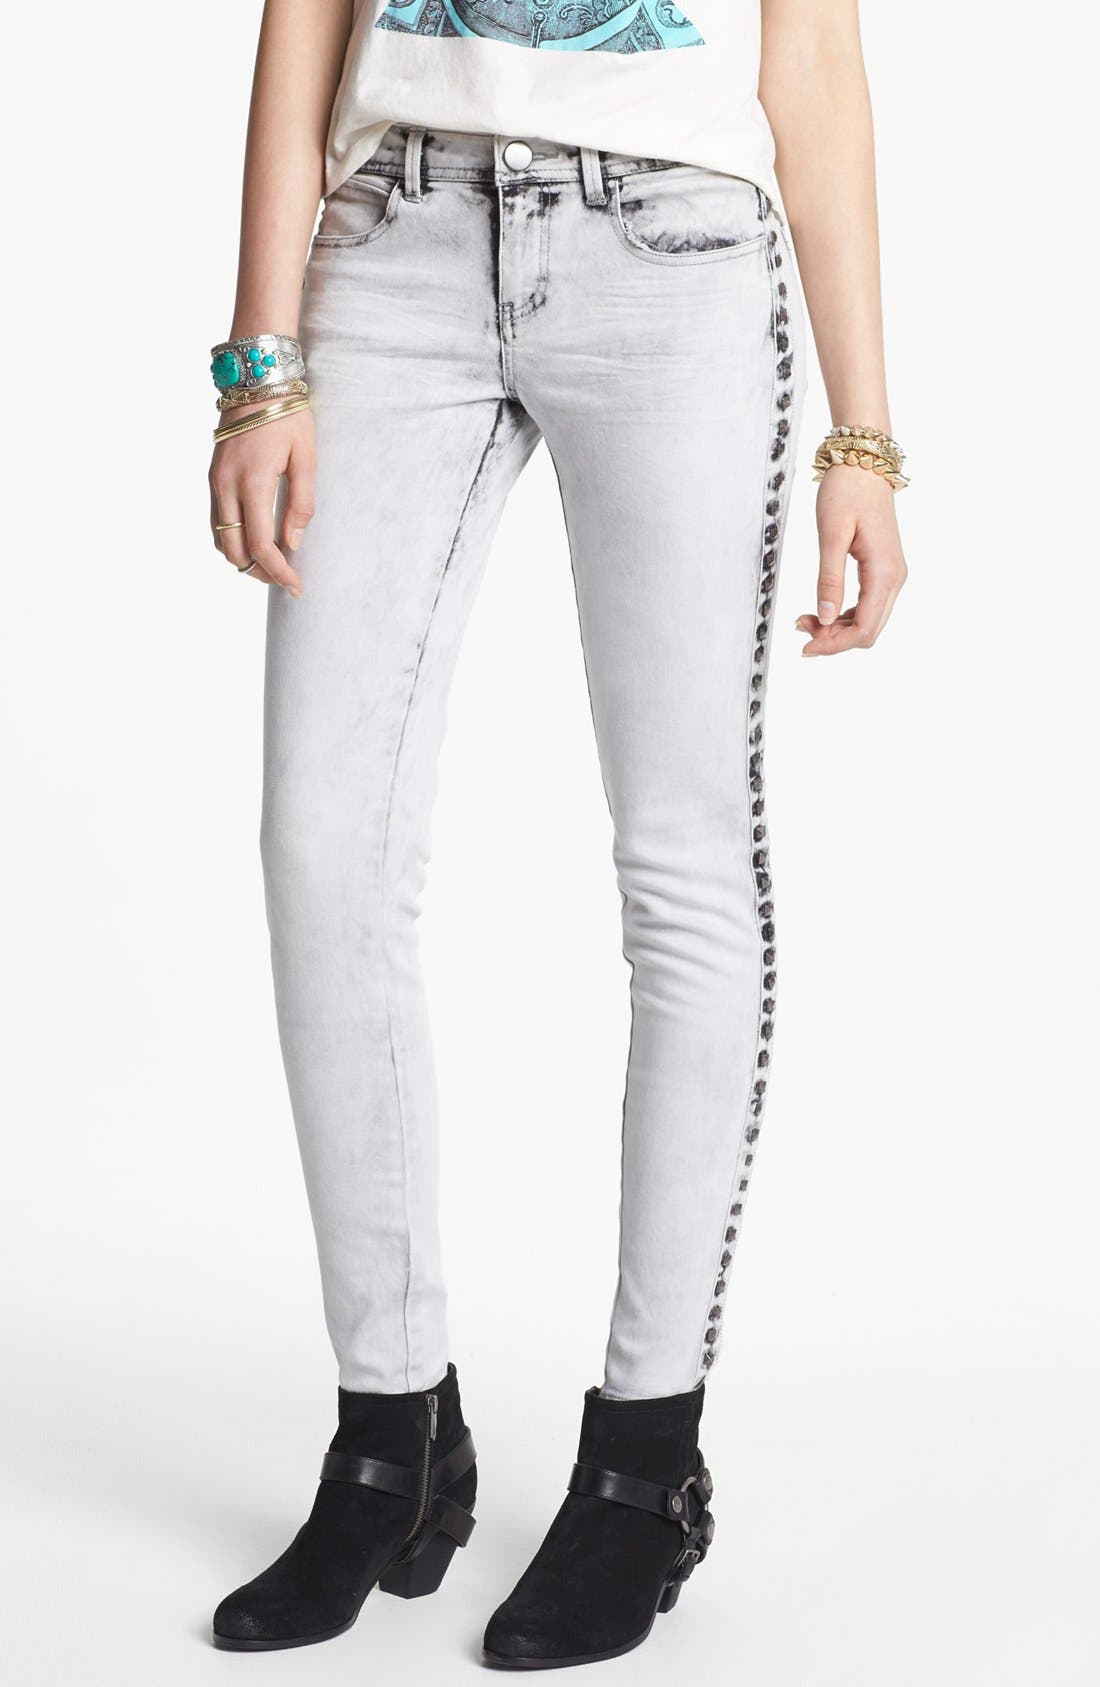 Main Image - Fire Studded Acid Wash Skinny Jeans (Grey) (Juniors)